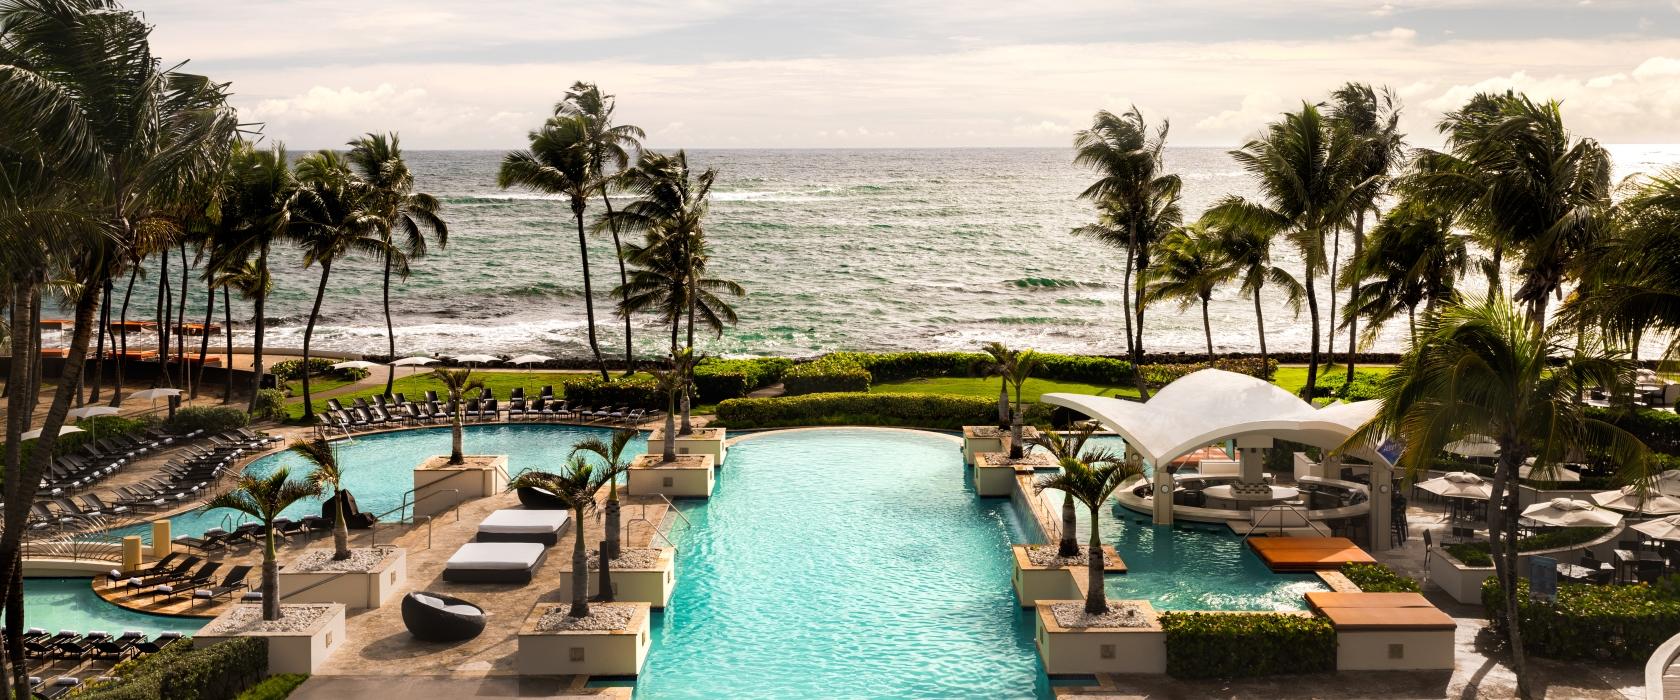 Caribe Hilton San Juan Hotel